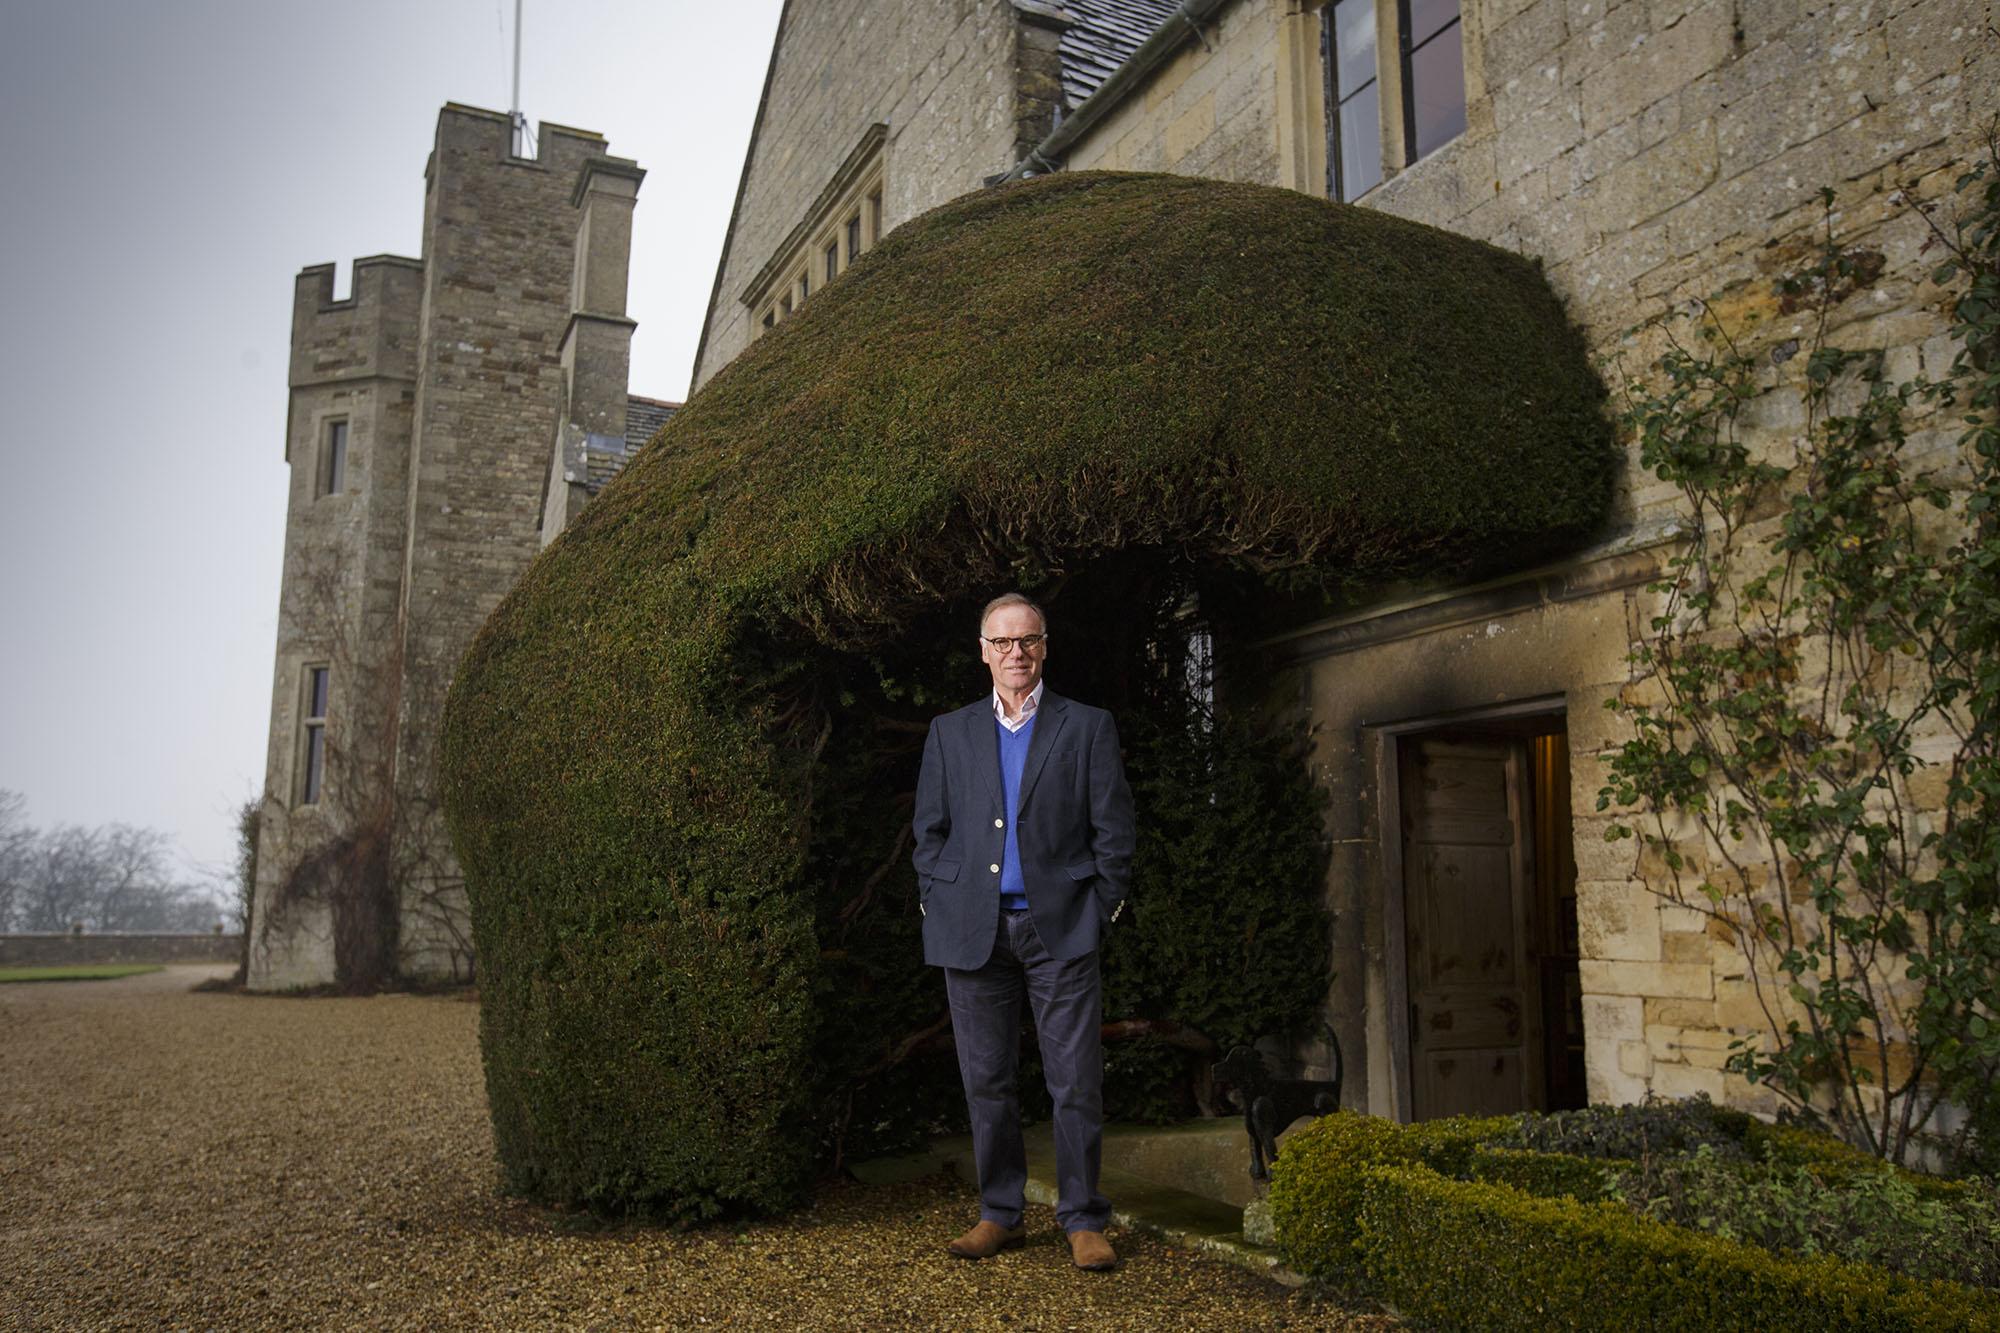 James Saunders Watson, owner of Rockingham Castle